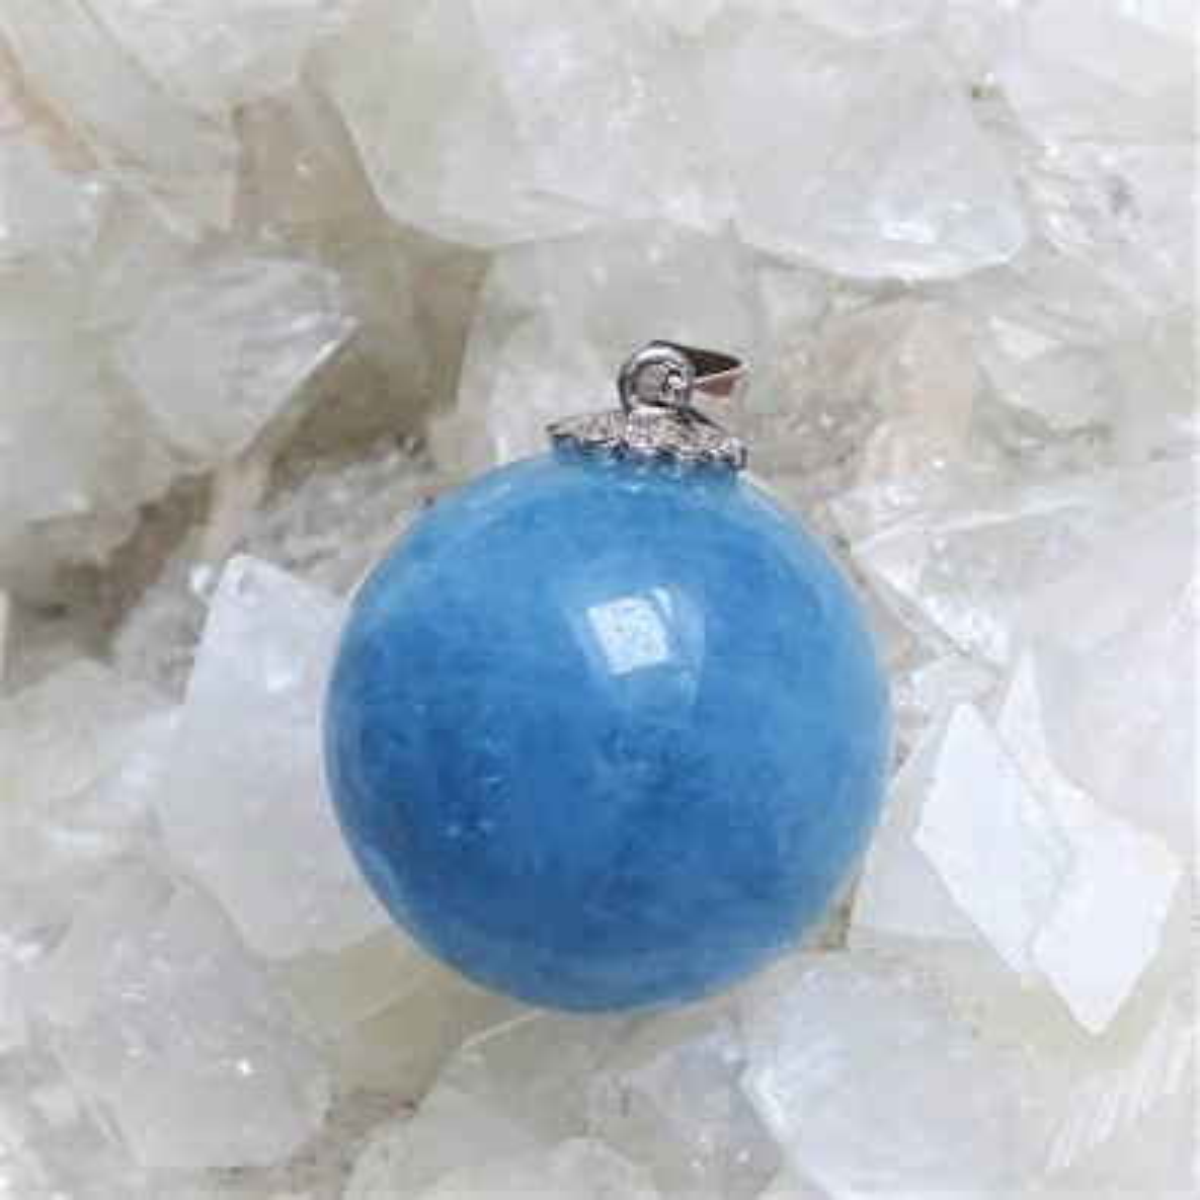 Aquamarine - pendant 15g, Brazil top quality